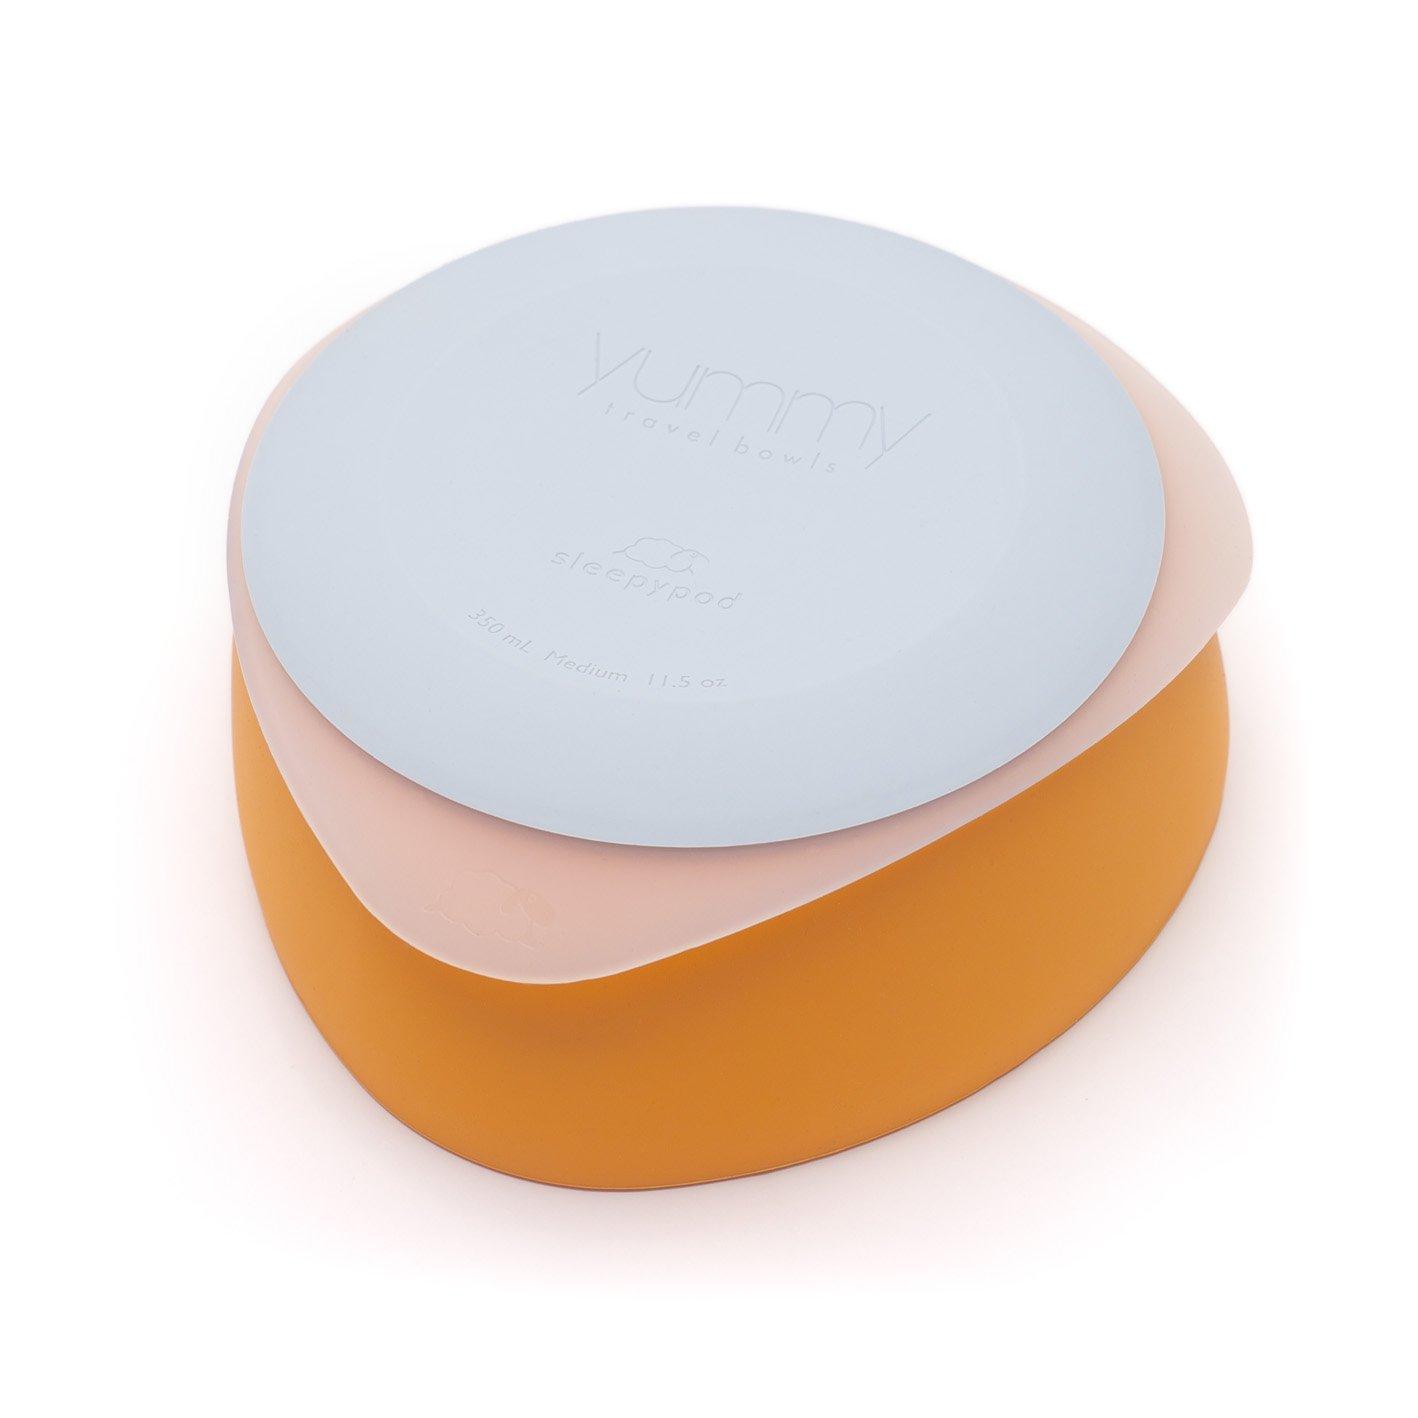 Sleepypod Yummy Travel Bowl Set (Medium Mango Tango) for dogs and cats by Sleepypod